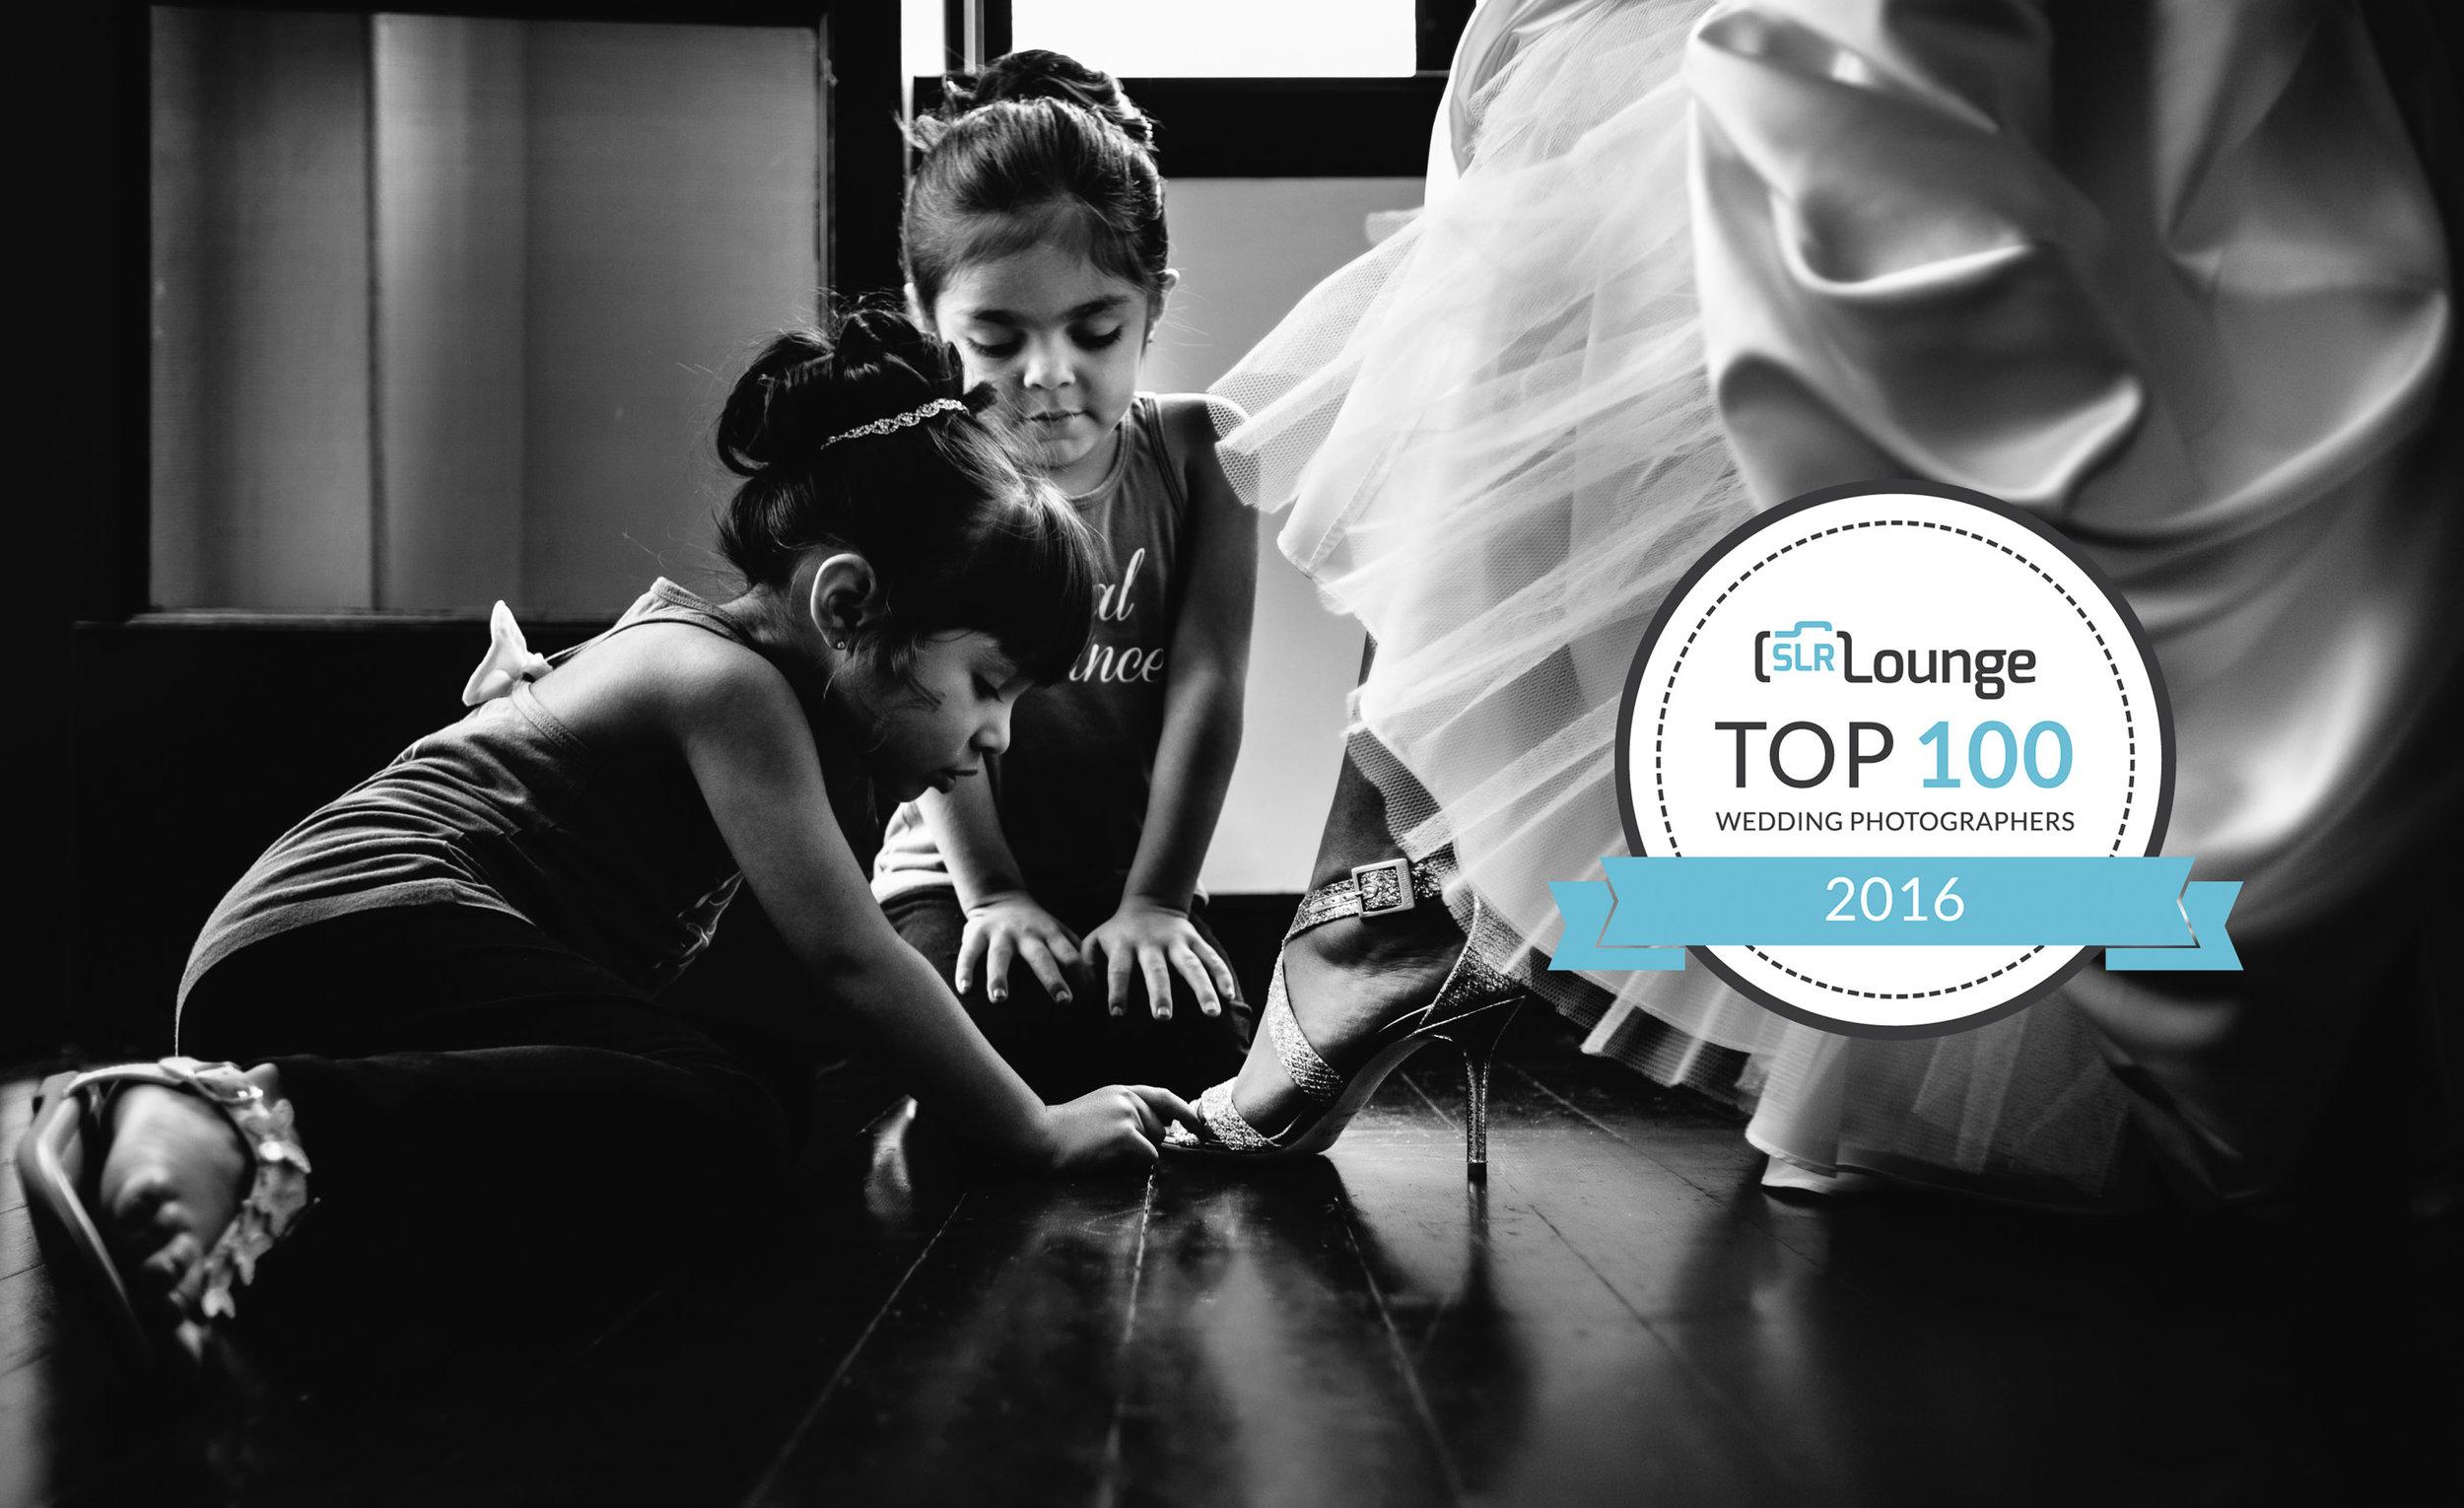 Callaway-Gable-Top-100-US-Wedding-Photographers.jpg